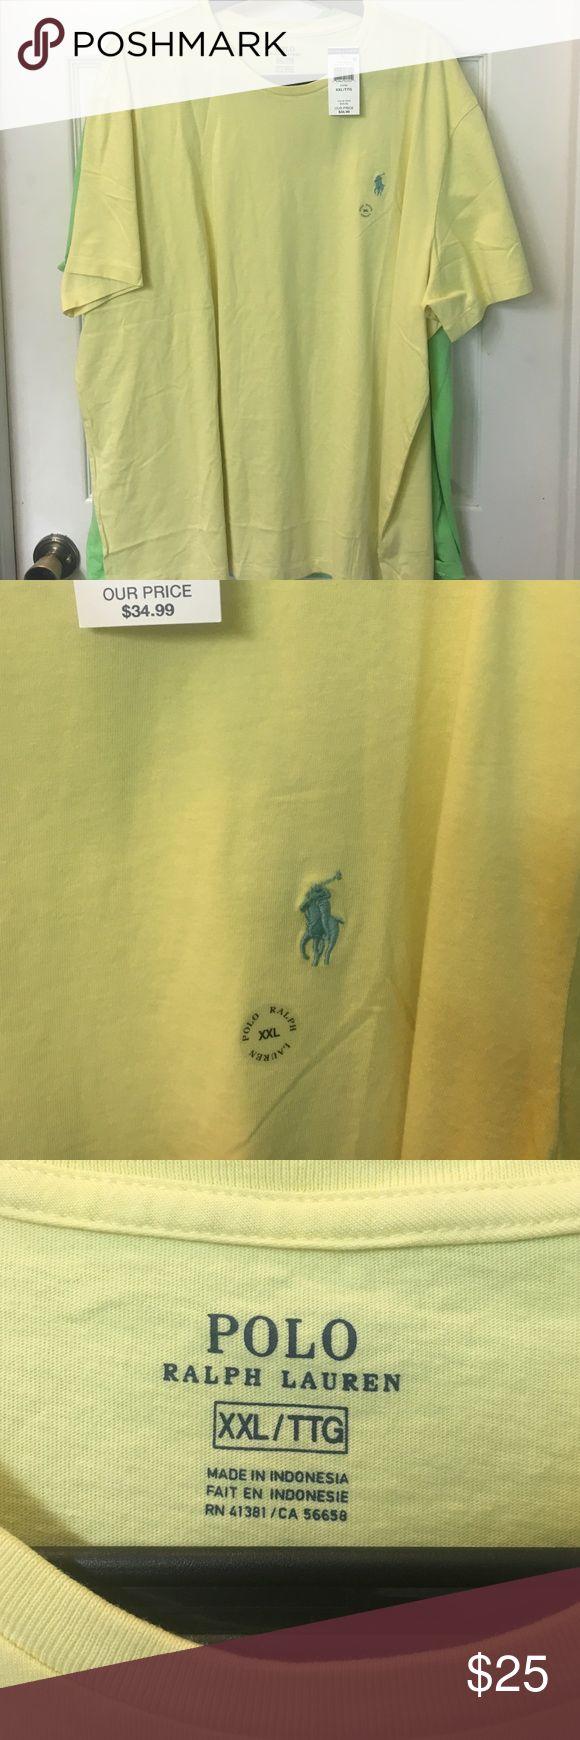 2 for 1 Polo tee shirt bundle Brand new polo tee shirt Polo by Ralph Lauren Shirts Tees - Short Sleeve